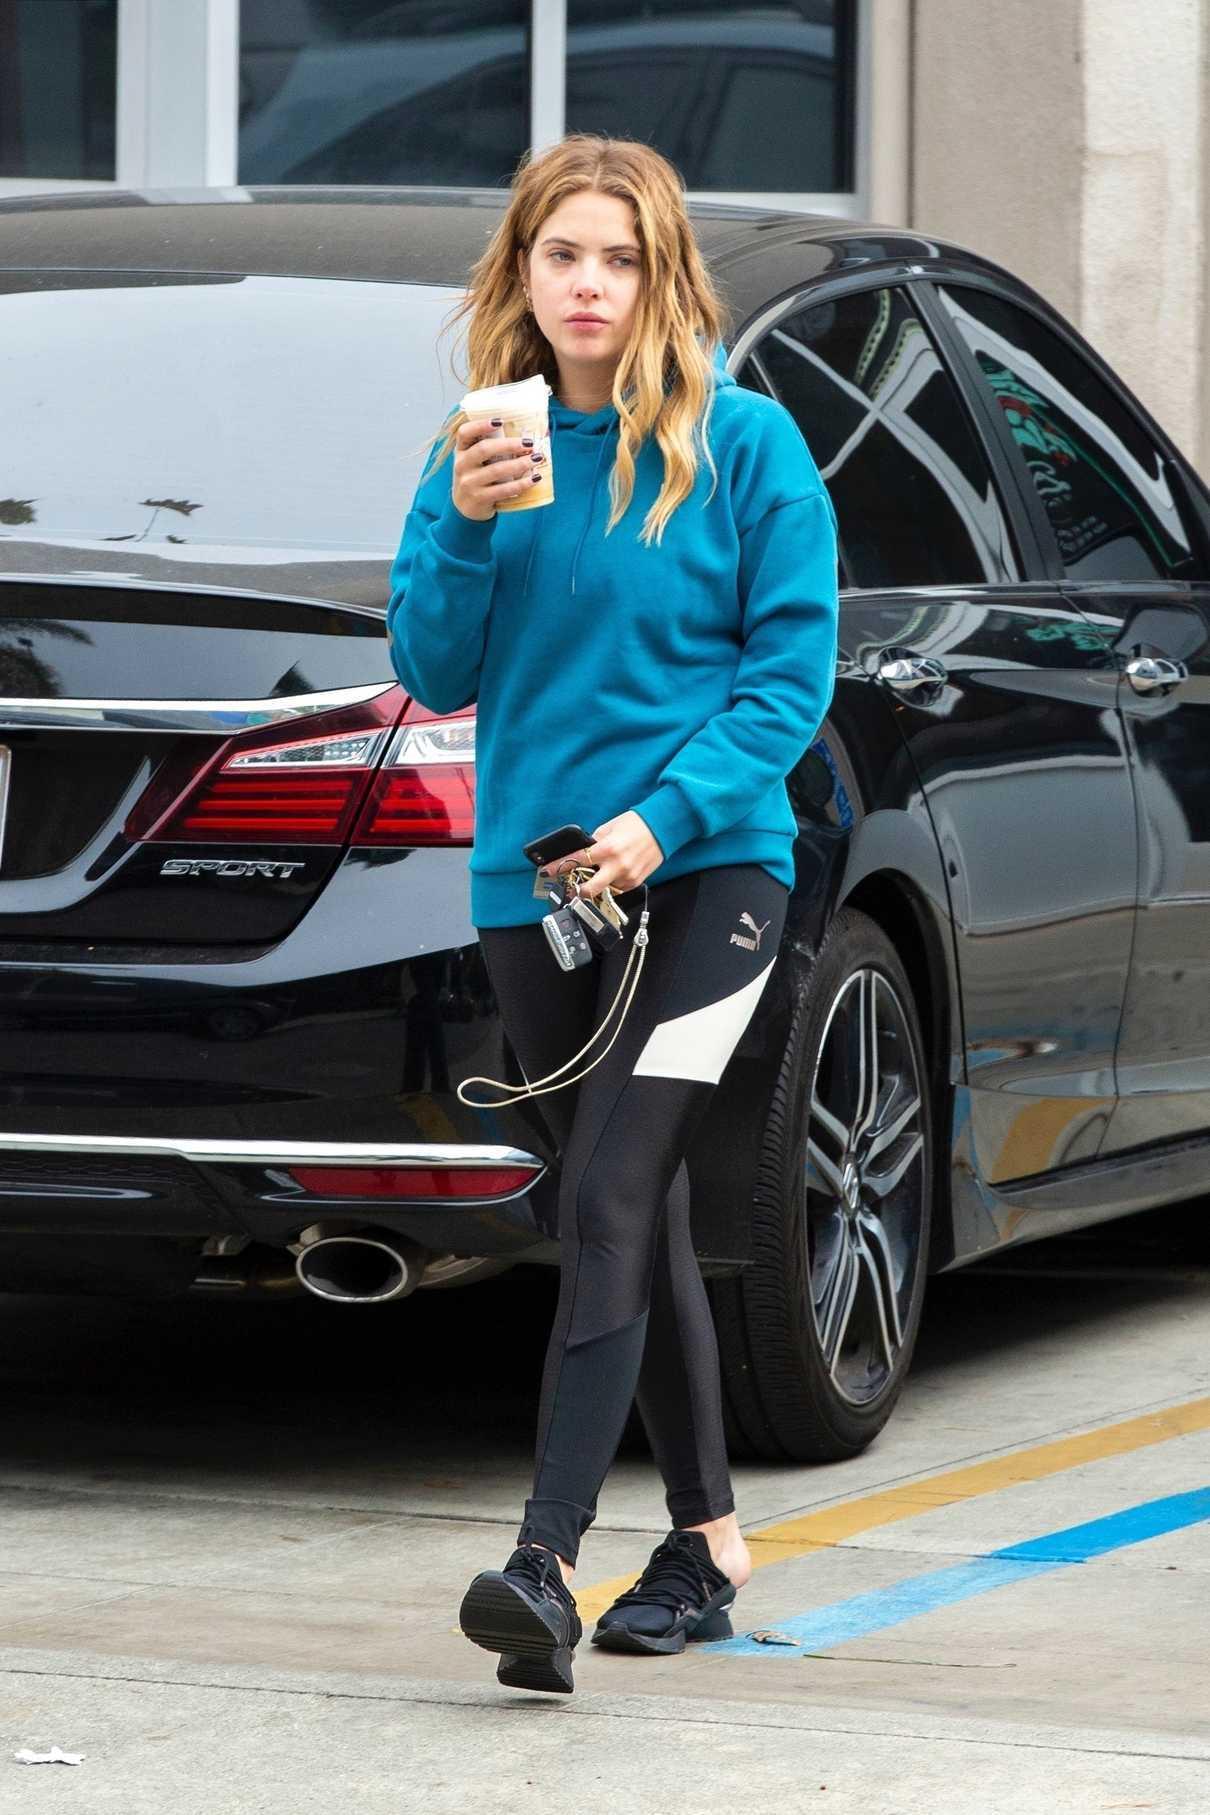 Ashley Benson in a Blue Hoody